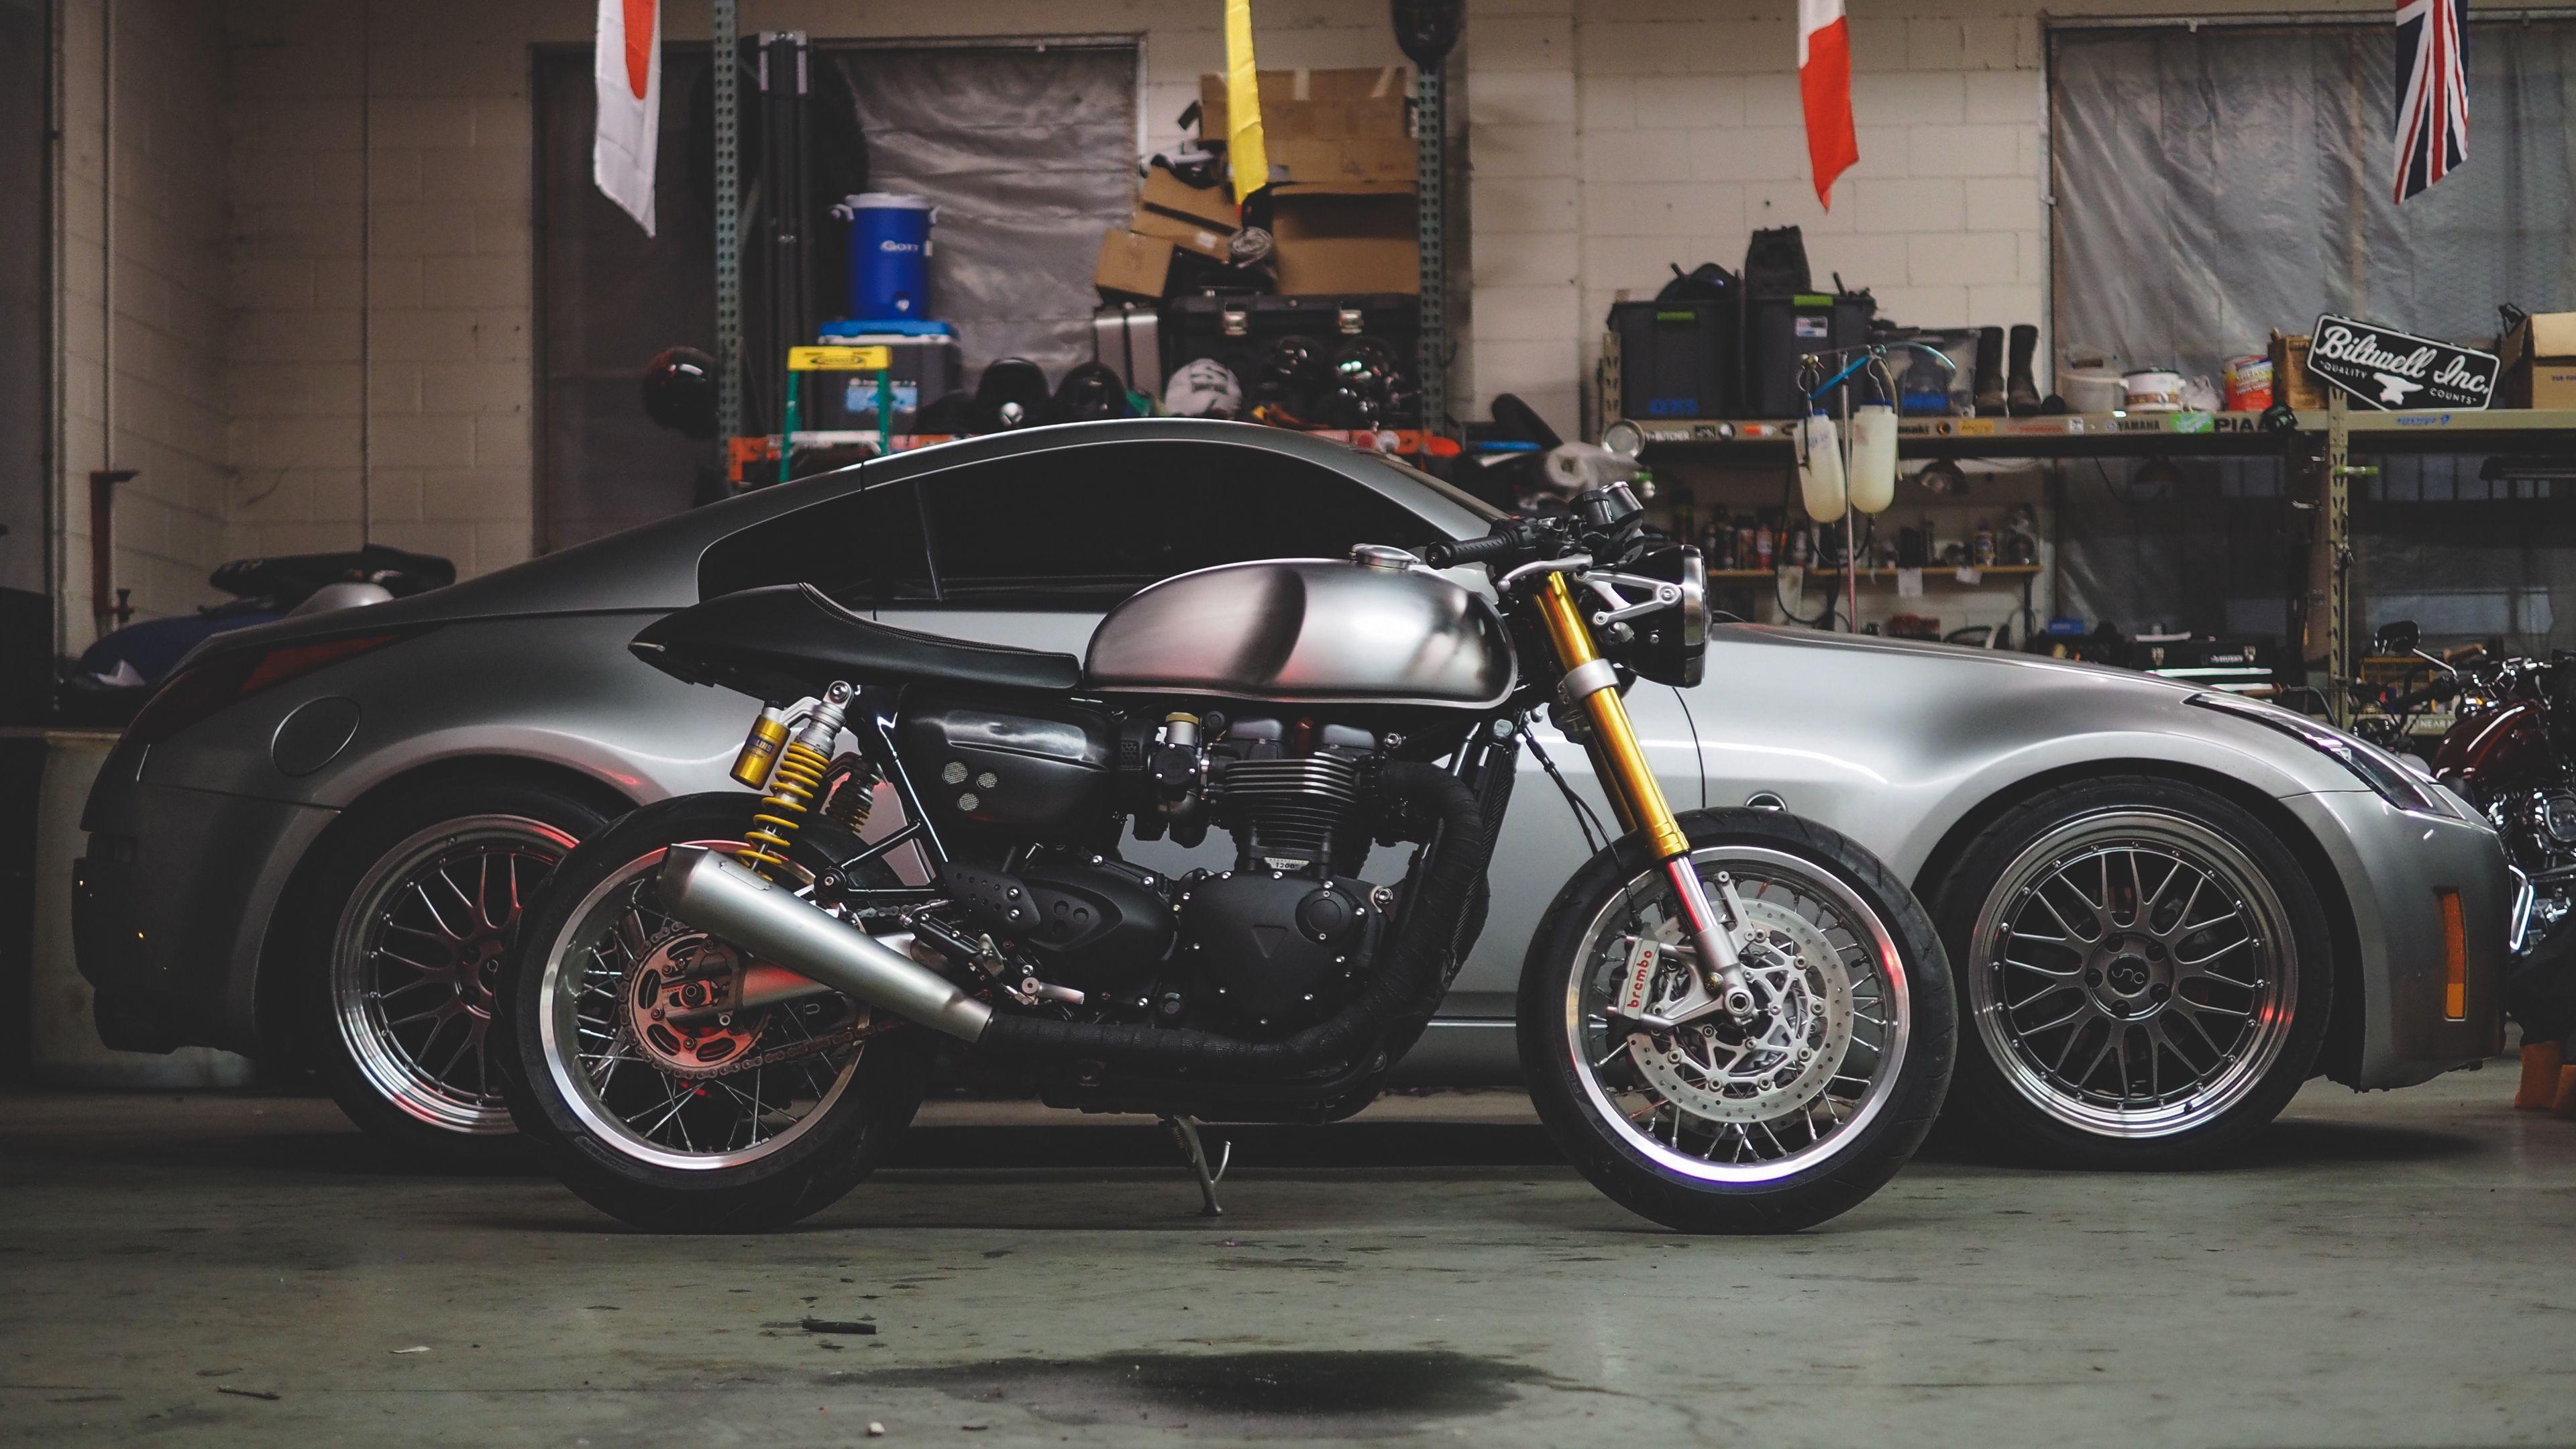 Car Motorcycle Garage 4k 4k Hd Wallpapers Motorcycle Hd Motorcycles Motorcycle Garage